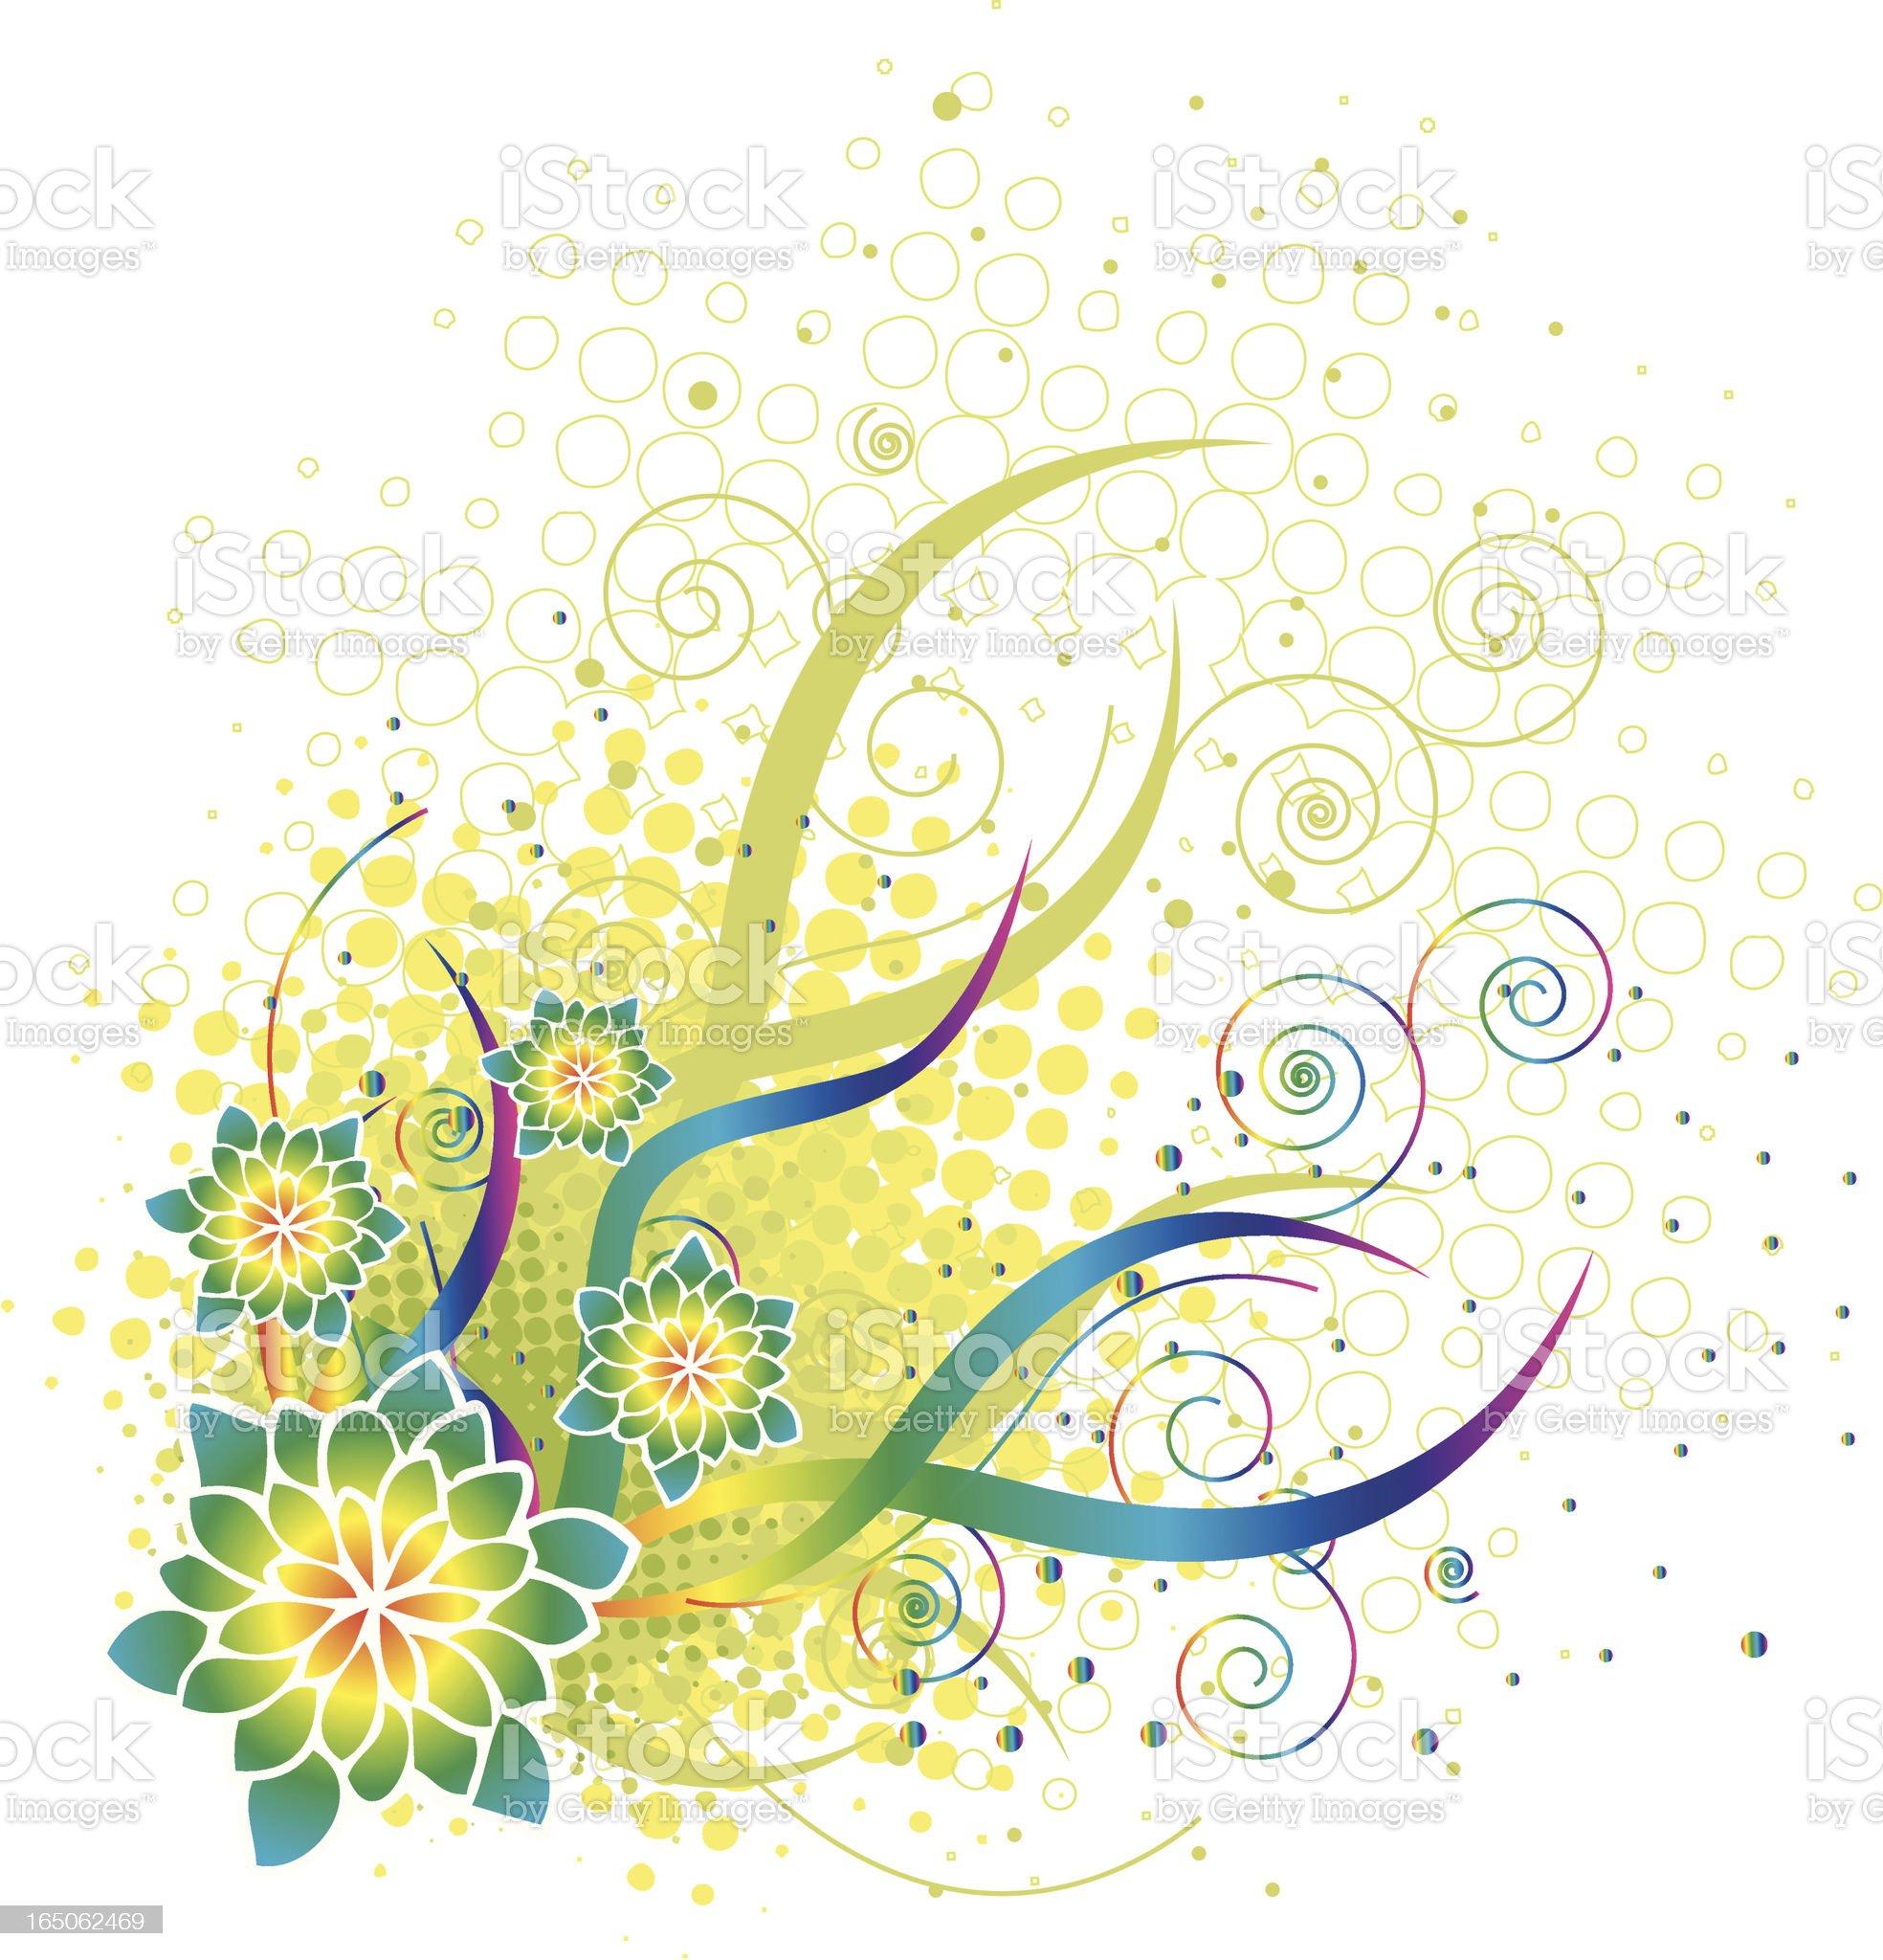 Seasonal Floral design royalty-free stock vector art